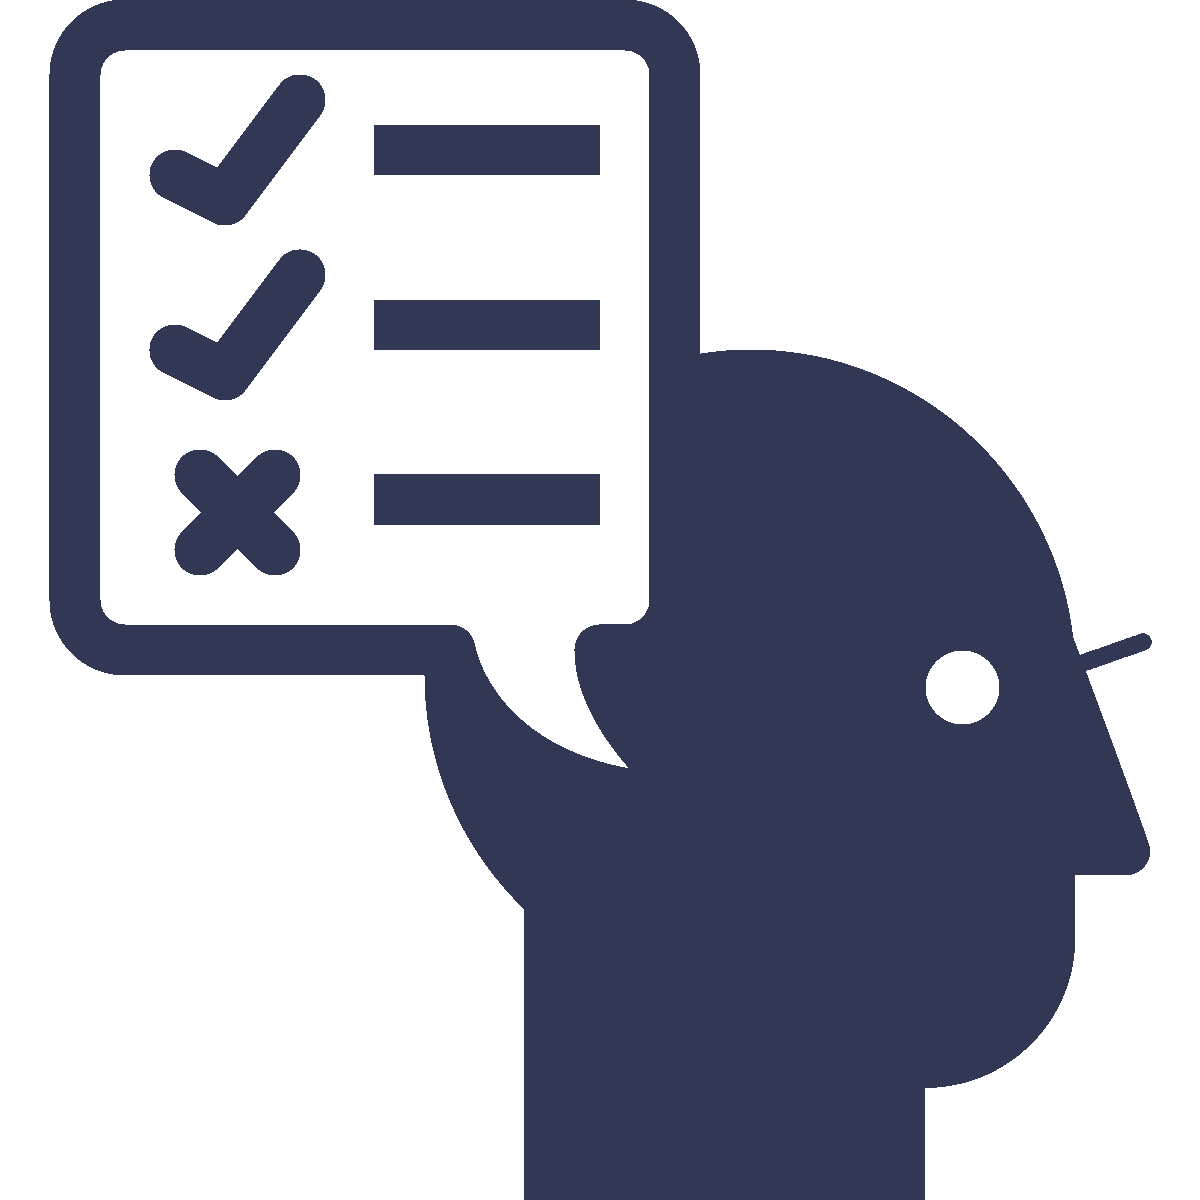 Professional clipart feasible. Online assessment platform hiring